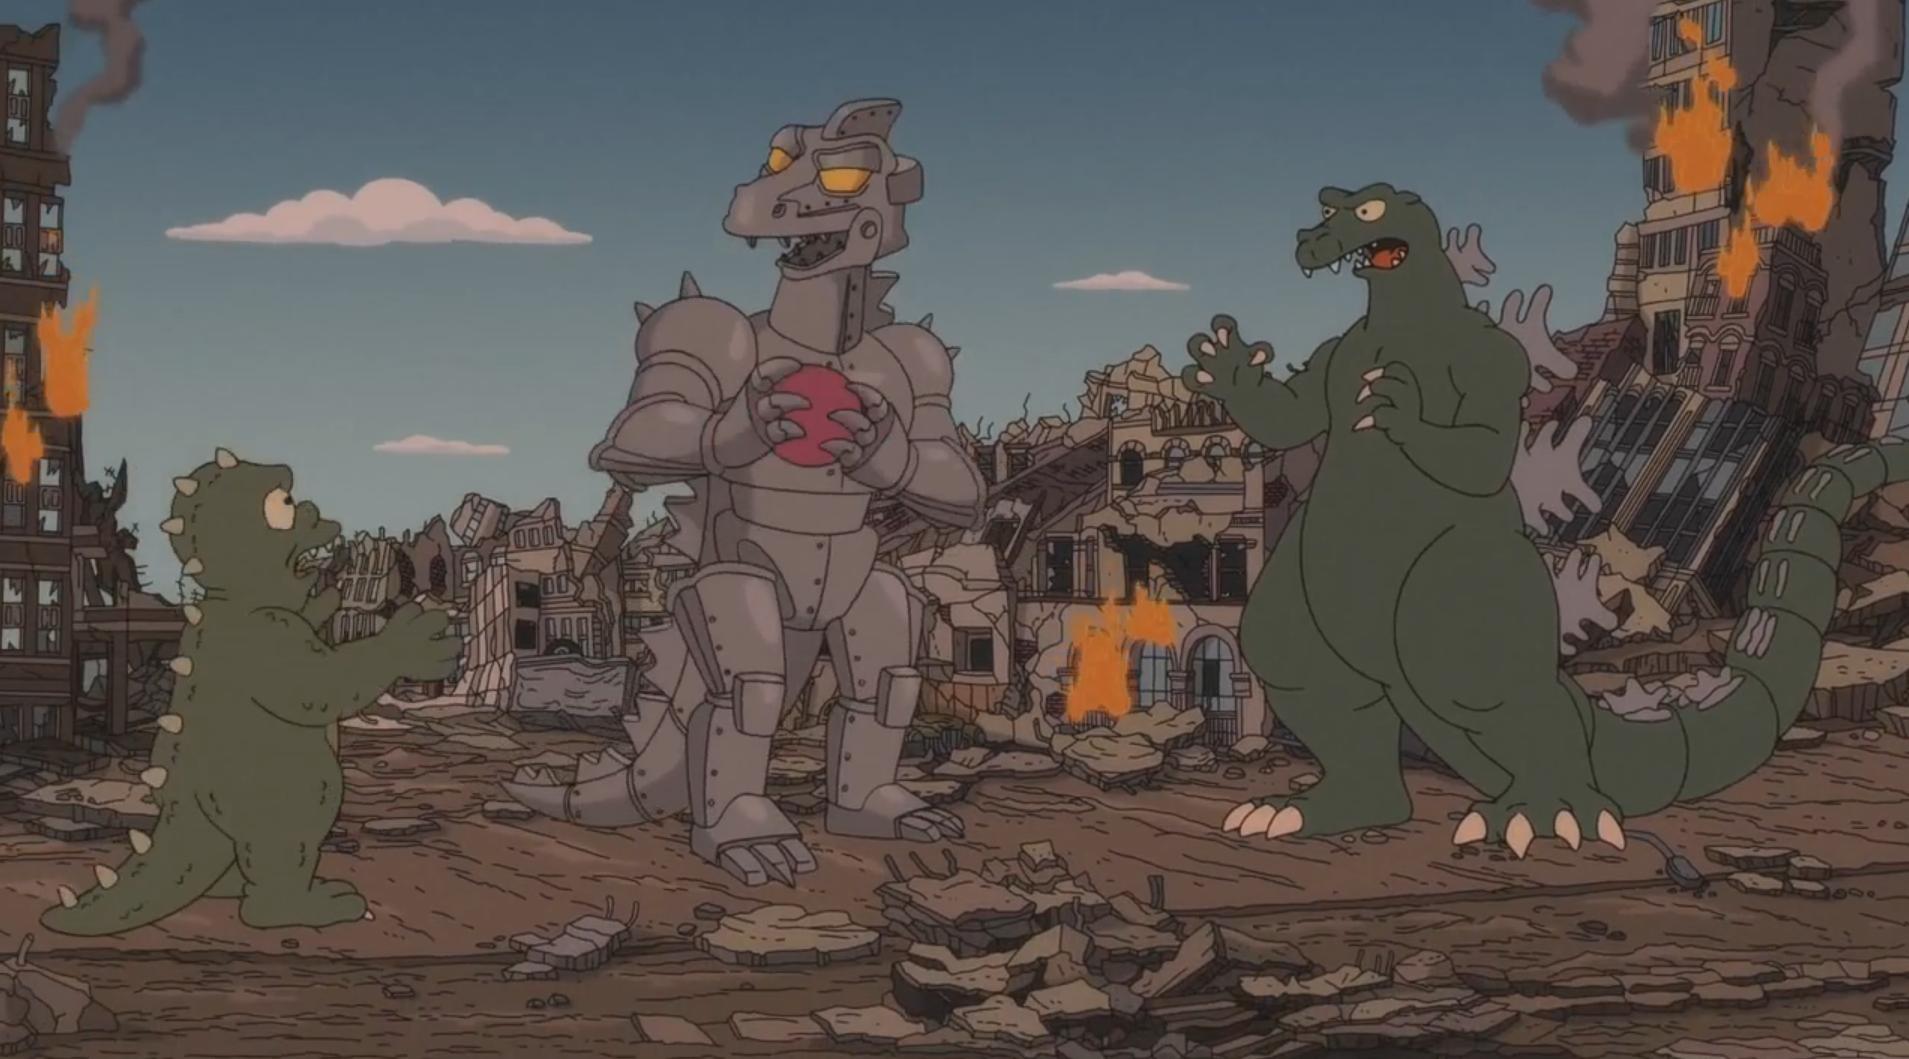 Godzilla Wikisimpsons The Simpsons Wiki